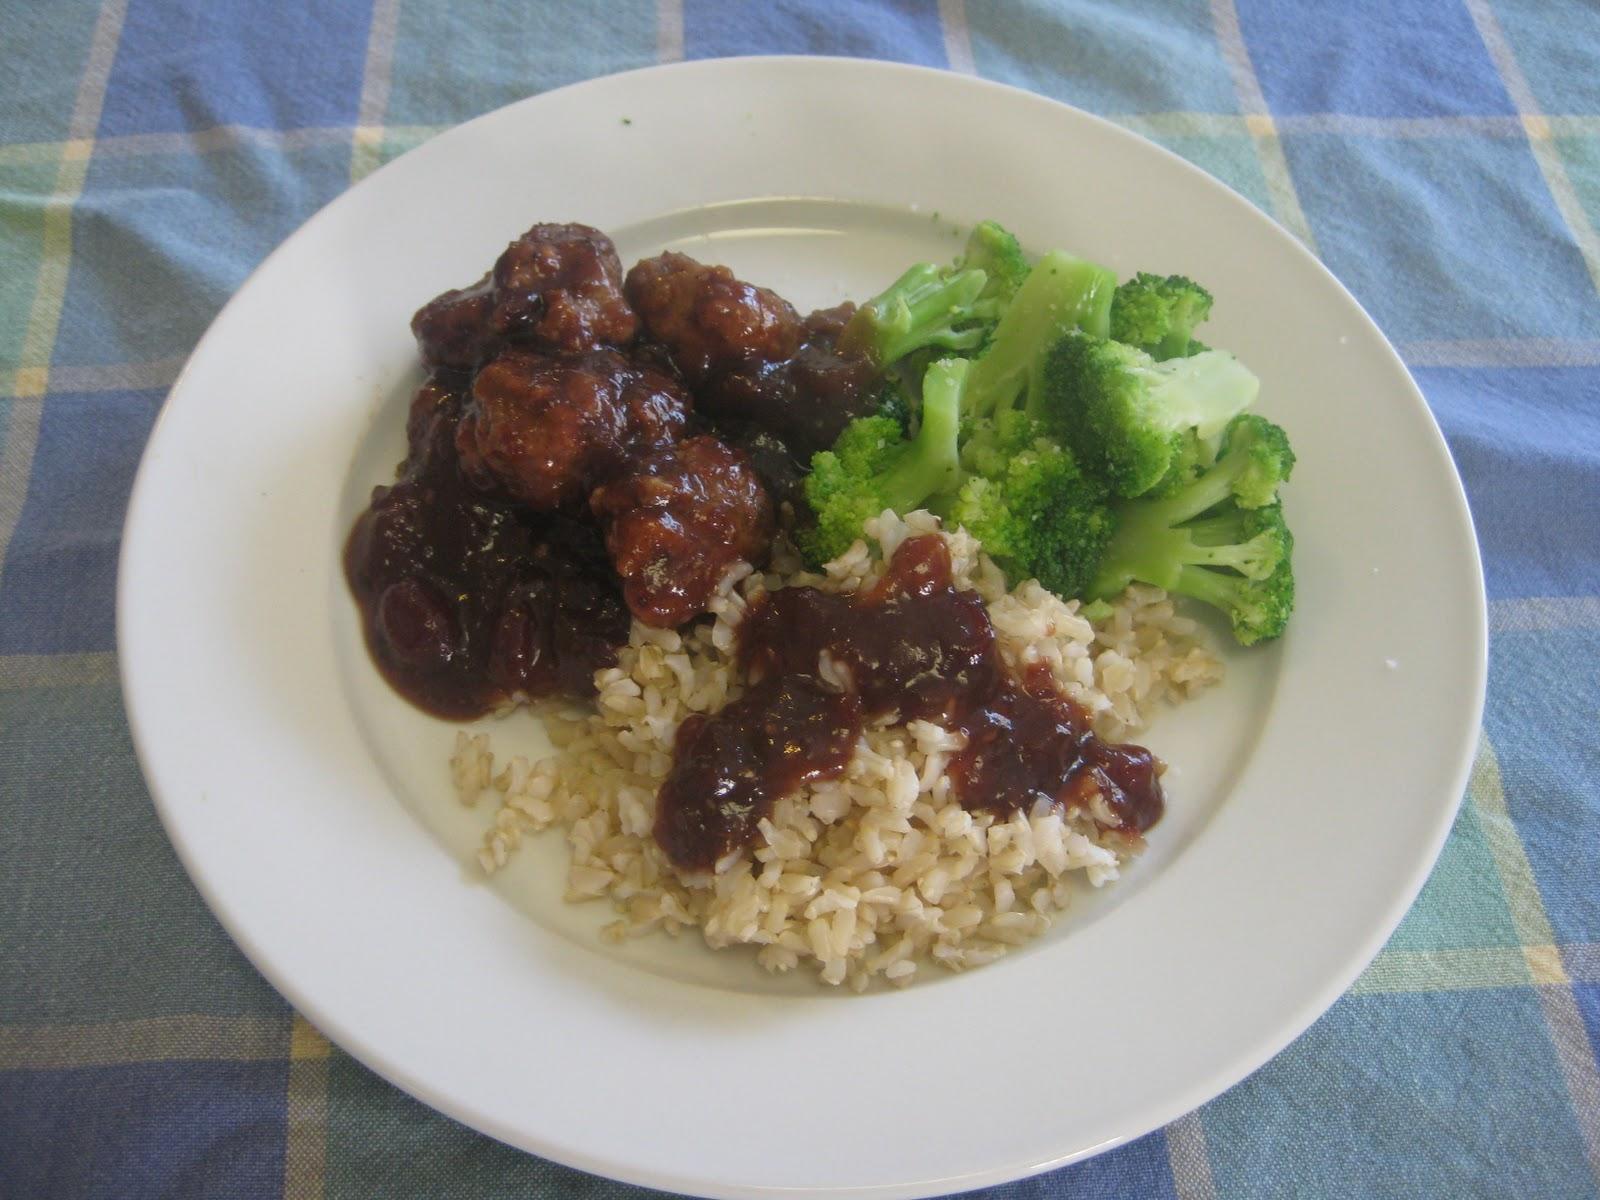 Heidi's Recipes: Turkey Cranberry Meatballs Recipe